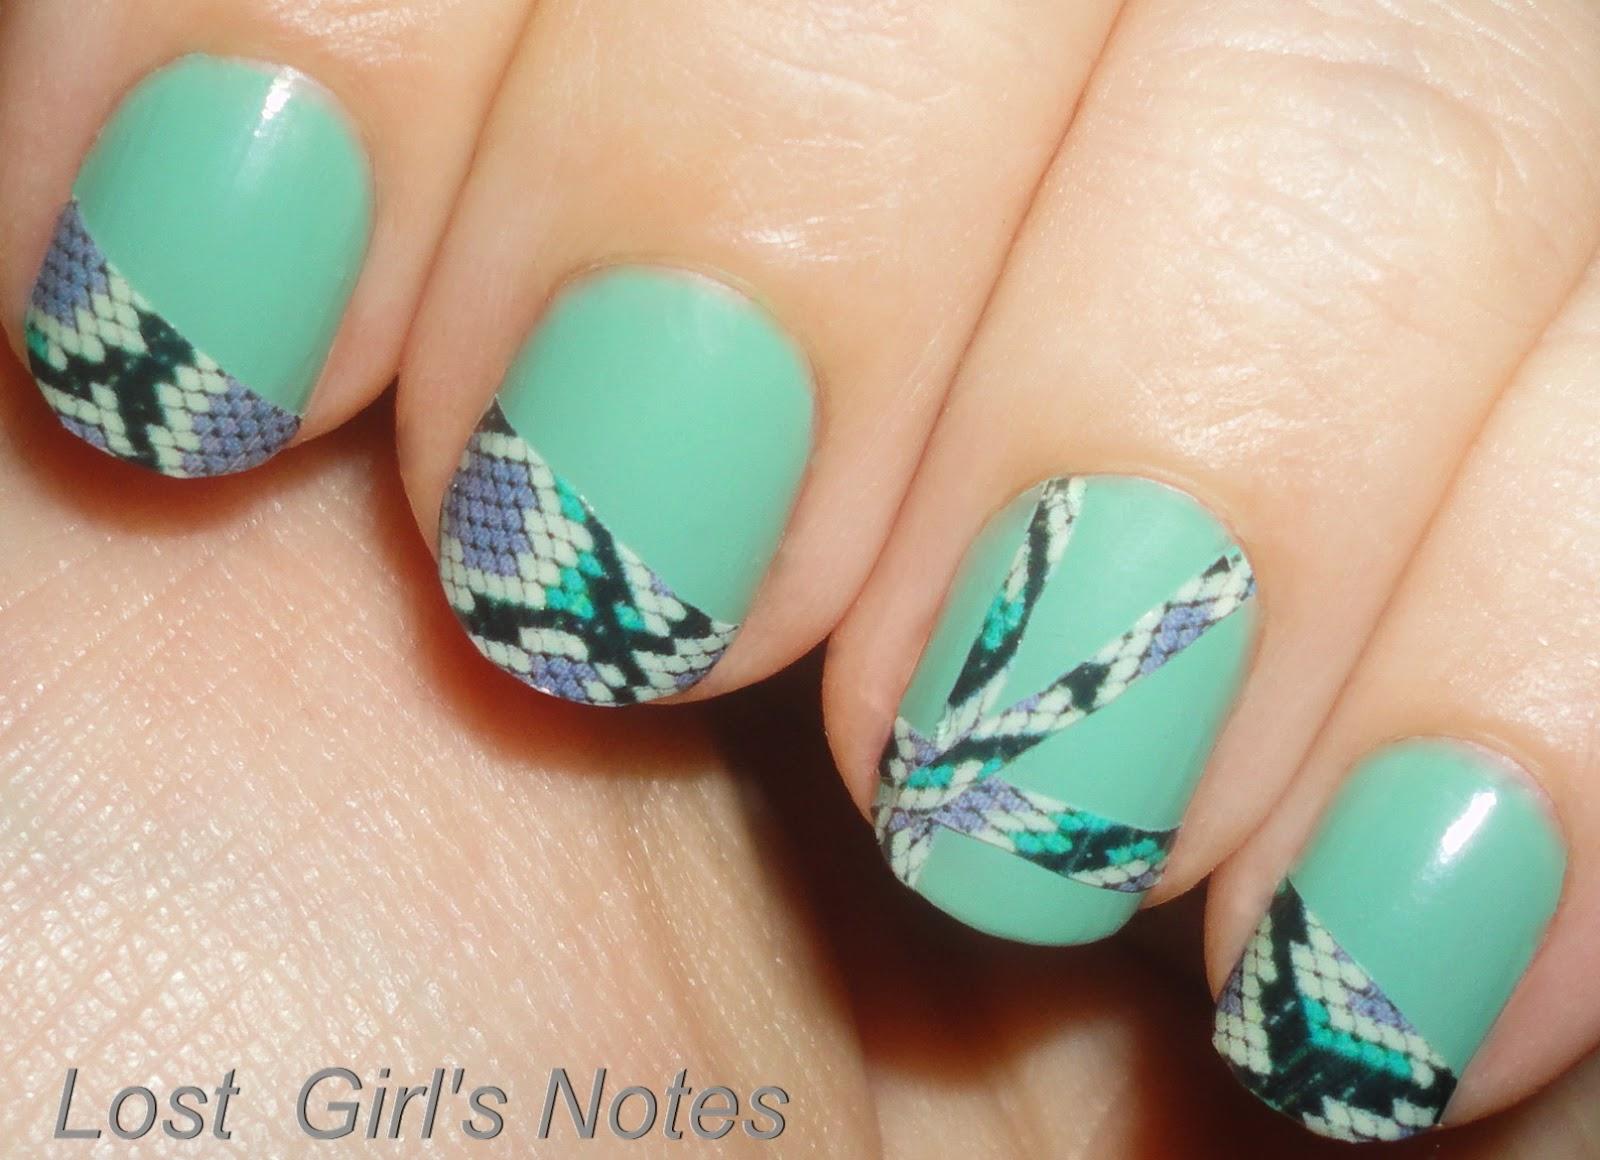 Nail and spa for you nail art designs prinsesfo Choice Image